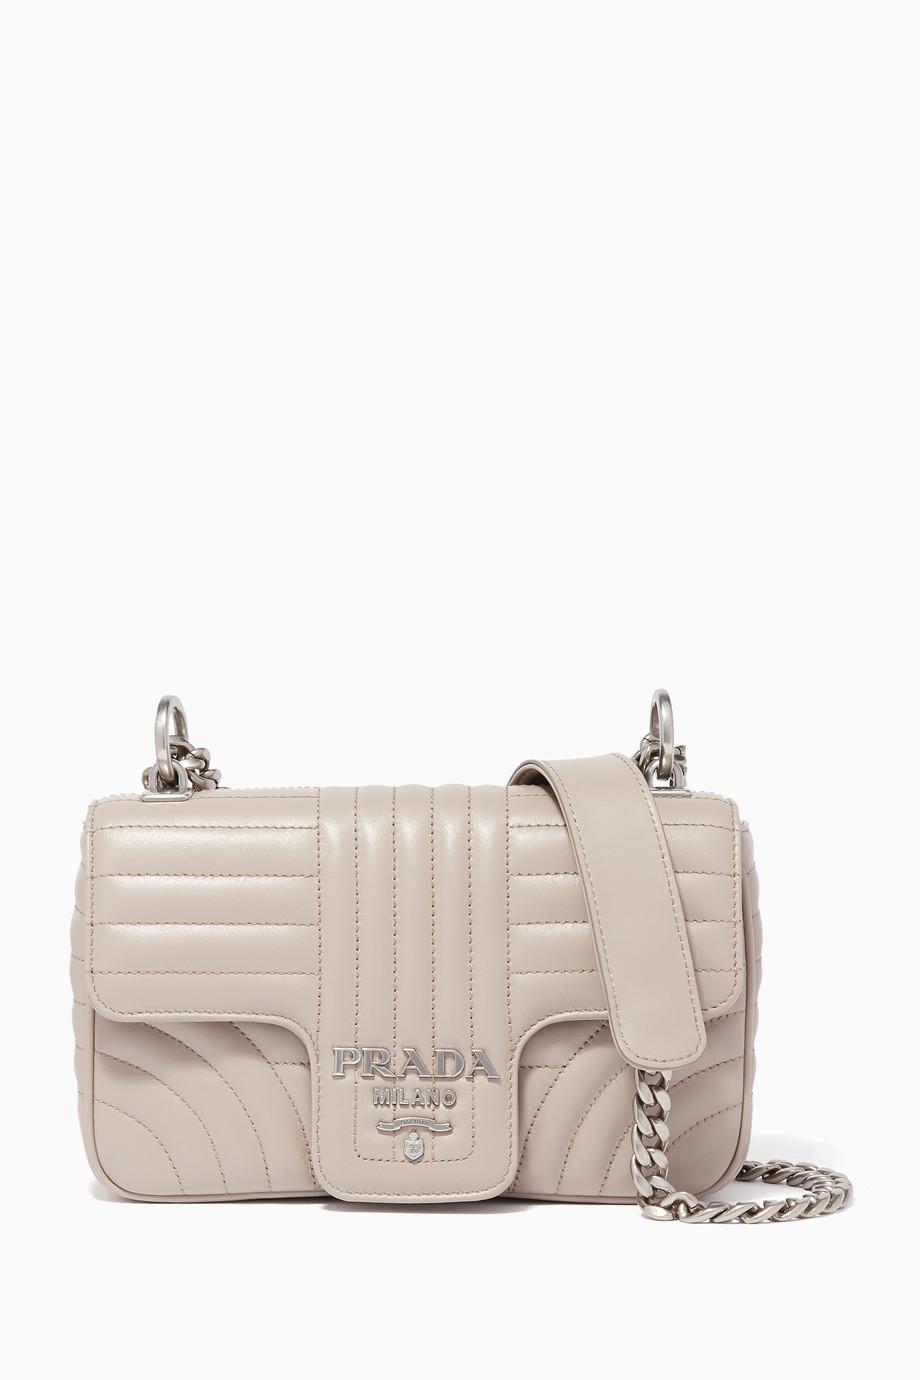 29b1c98578fa Shop Prada Neutral Light-Beige Diagramme Quilted Small Shoulder Bag ...